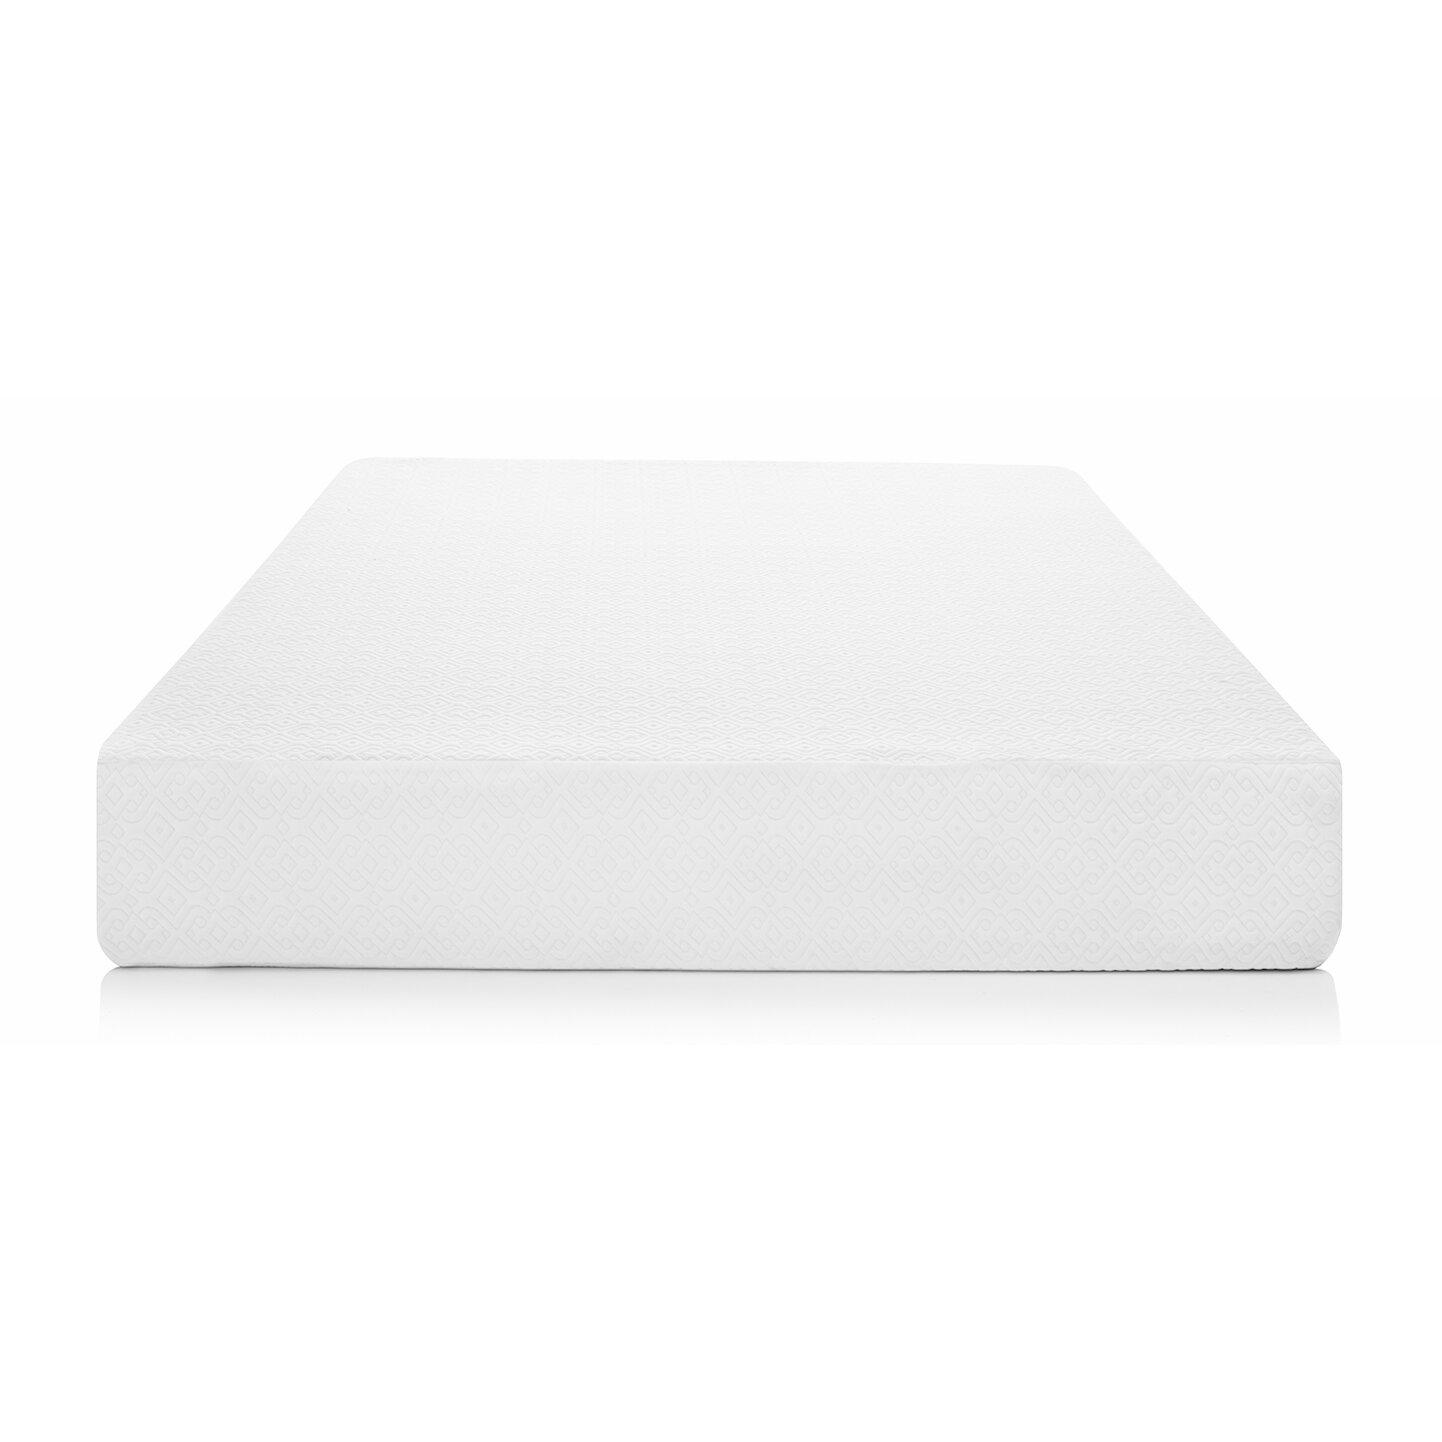 12 Plush Gel Memory Foam Mattress 28 Images Unboxing Lucid 12